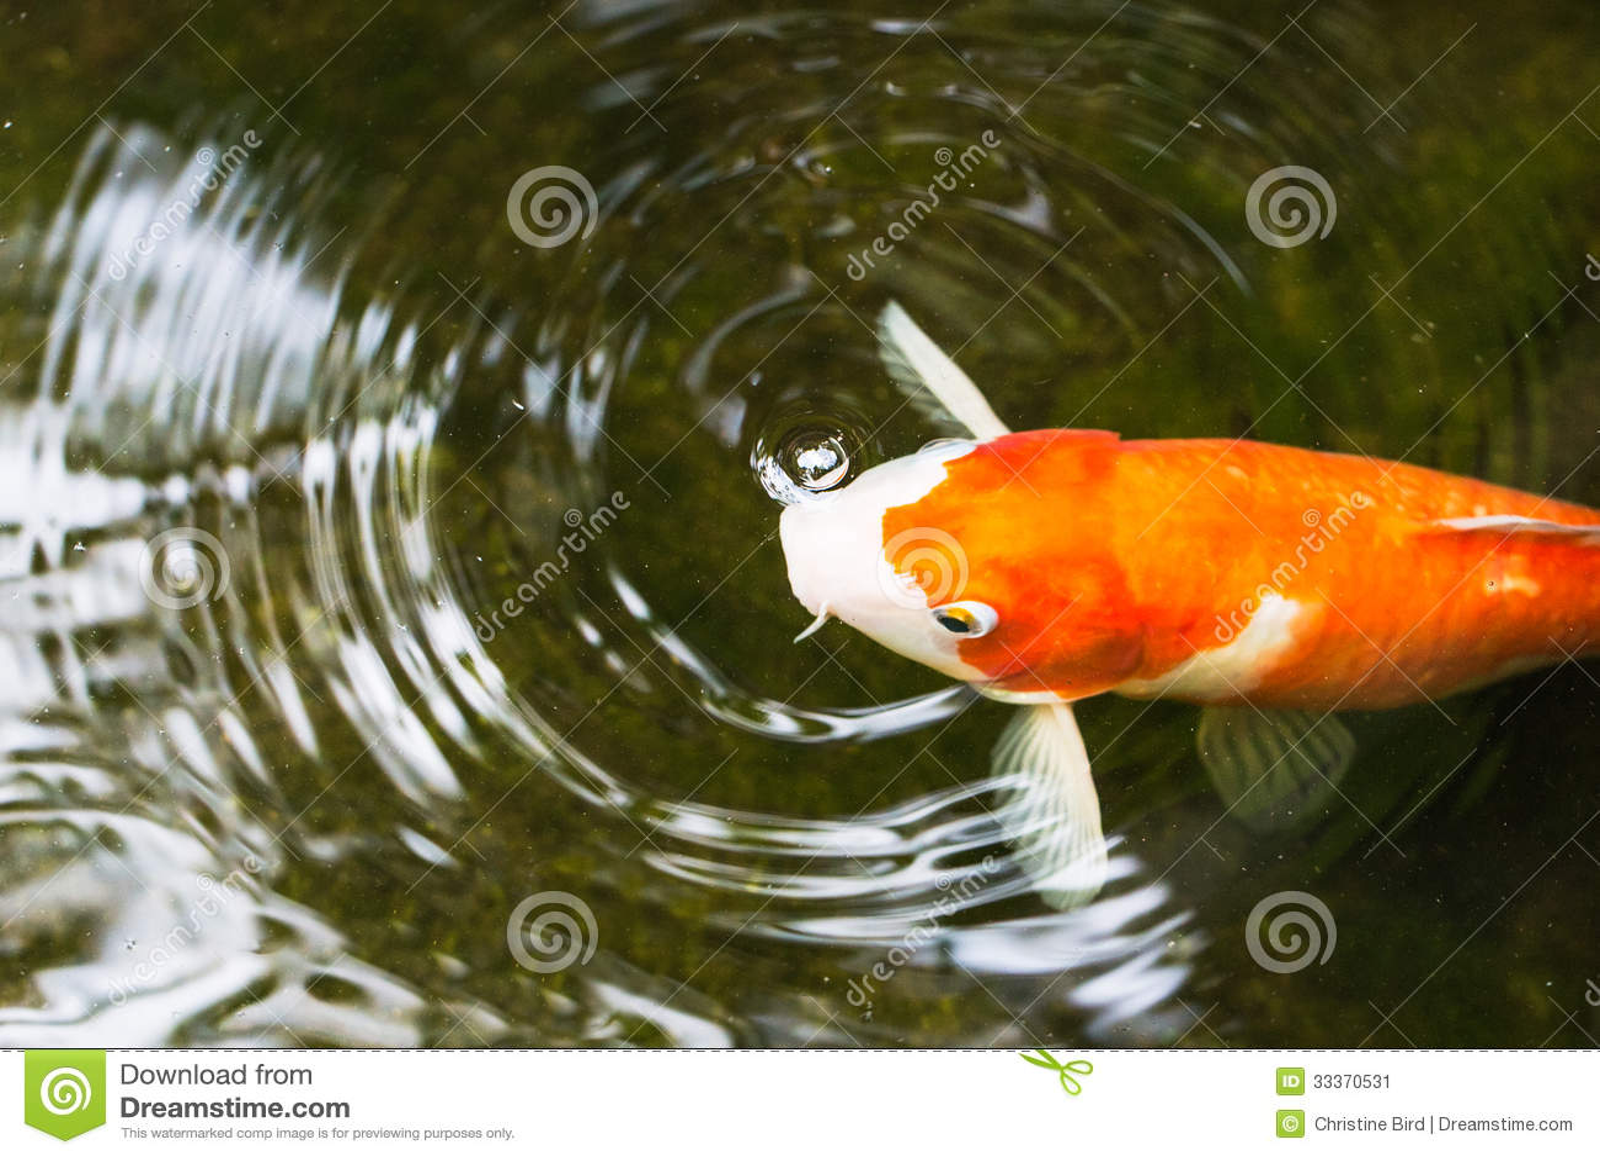 Koi carp stock image image 33370531 for Koi and carp